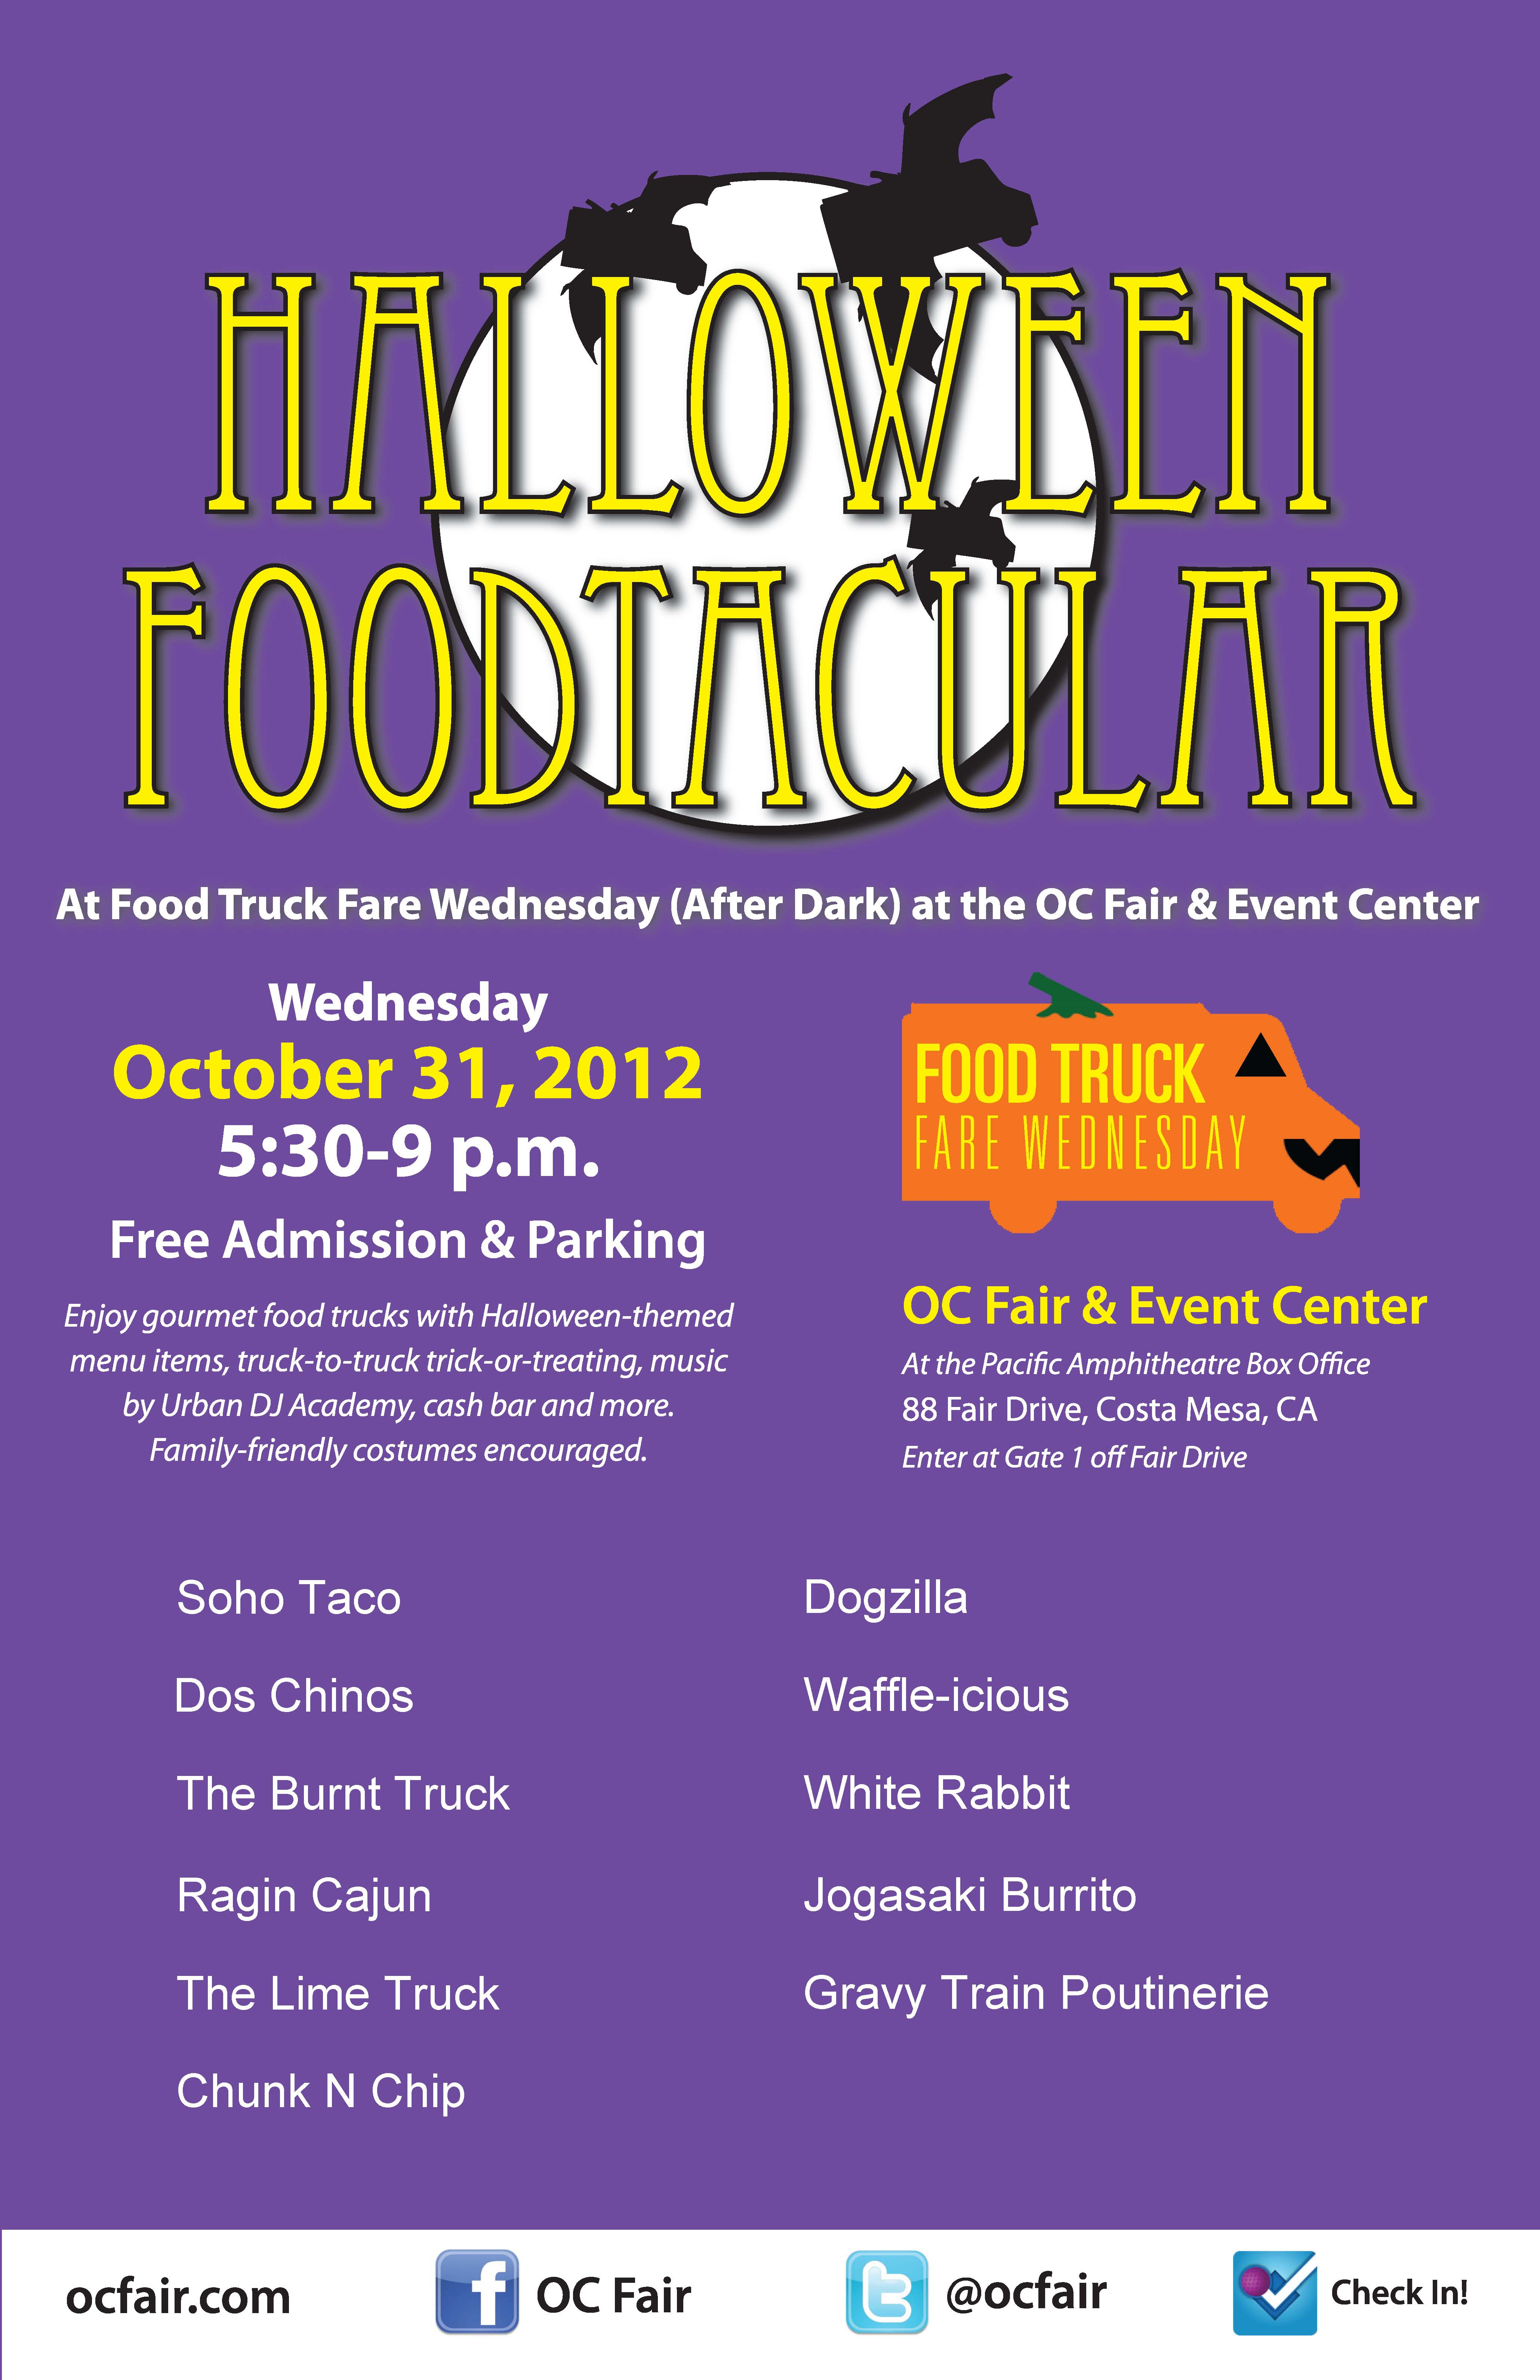 tonight 5 30p in costa misery halloween foodtacular at oc fair